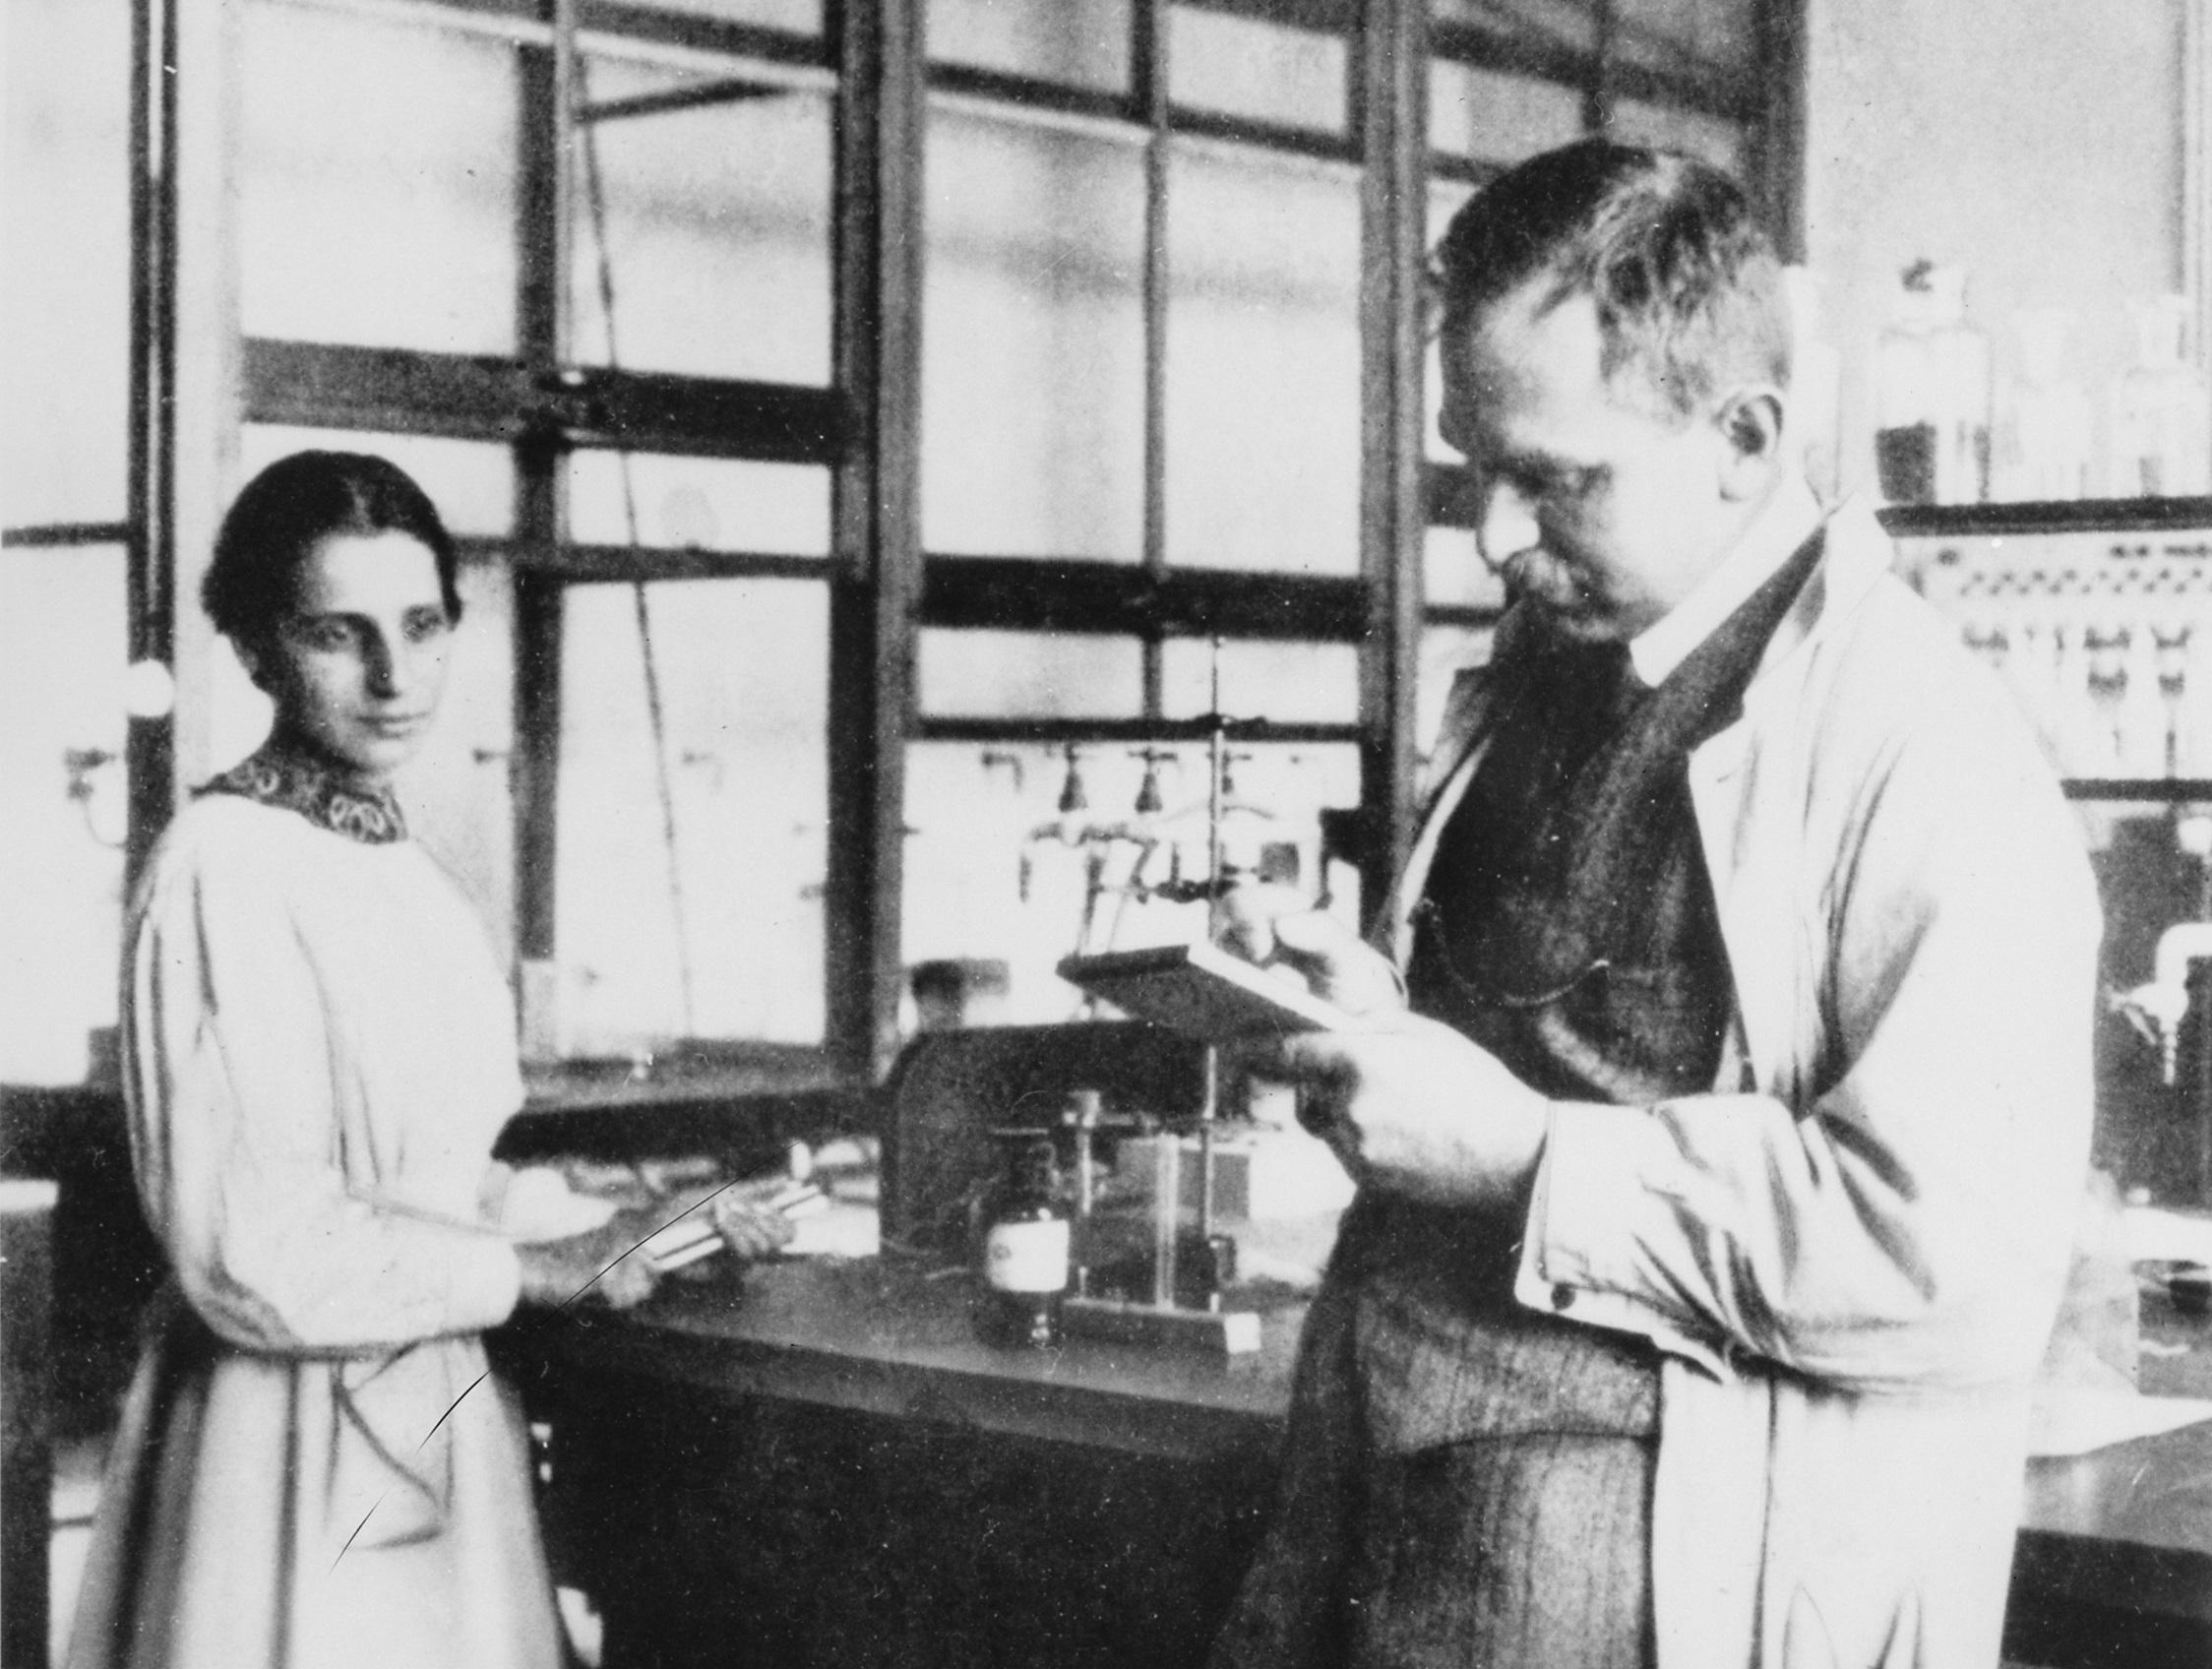 Otto Hahn y Lise Meitner